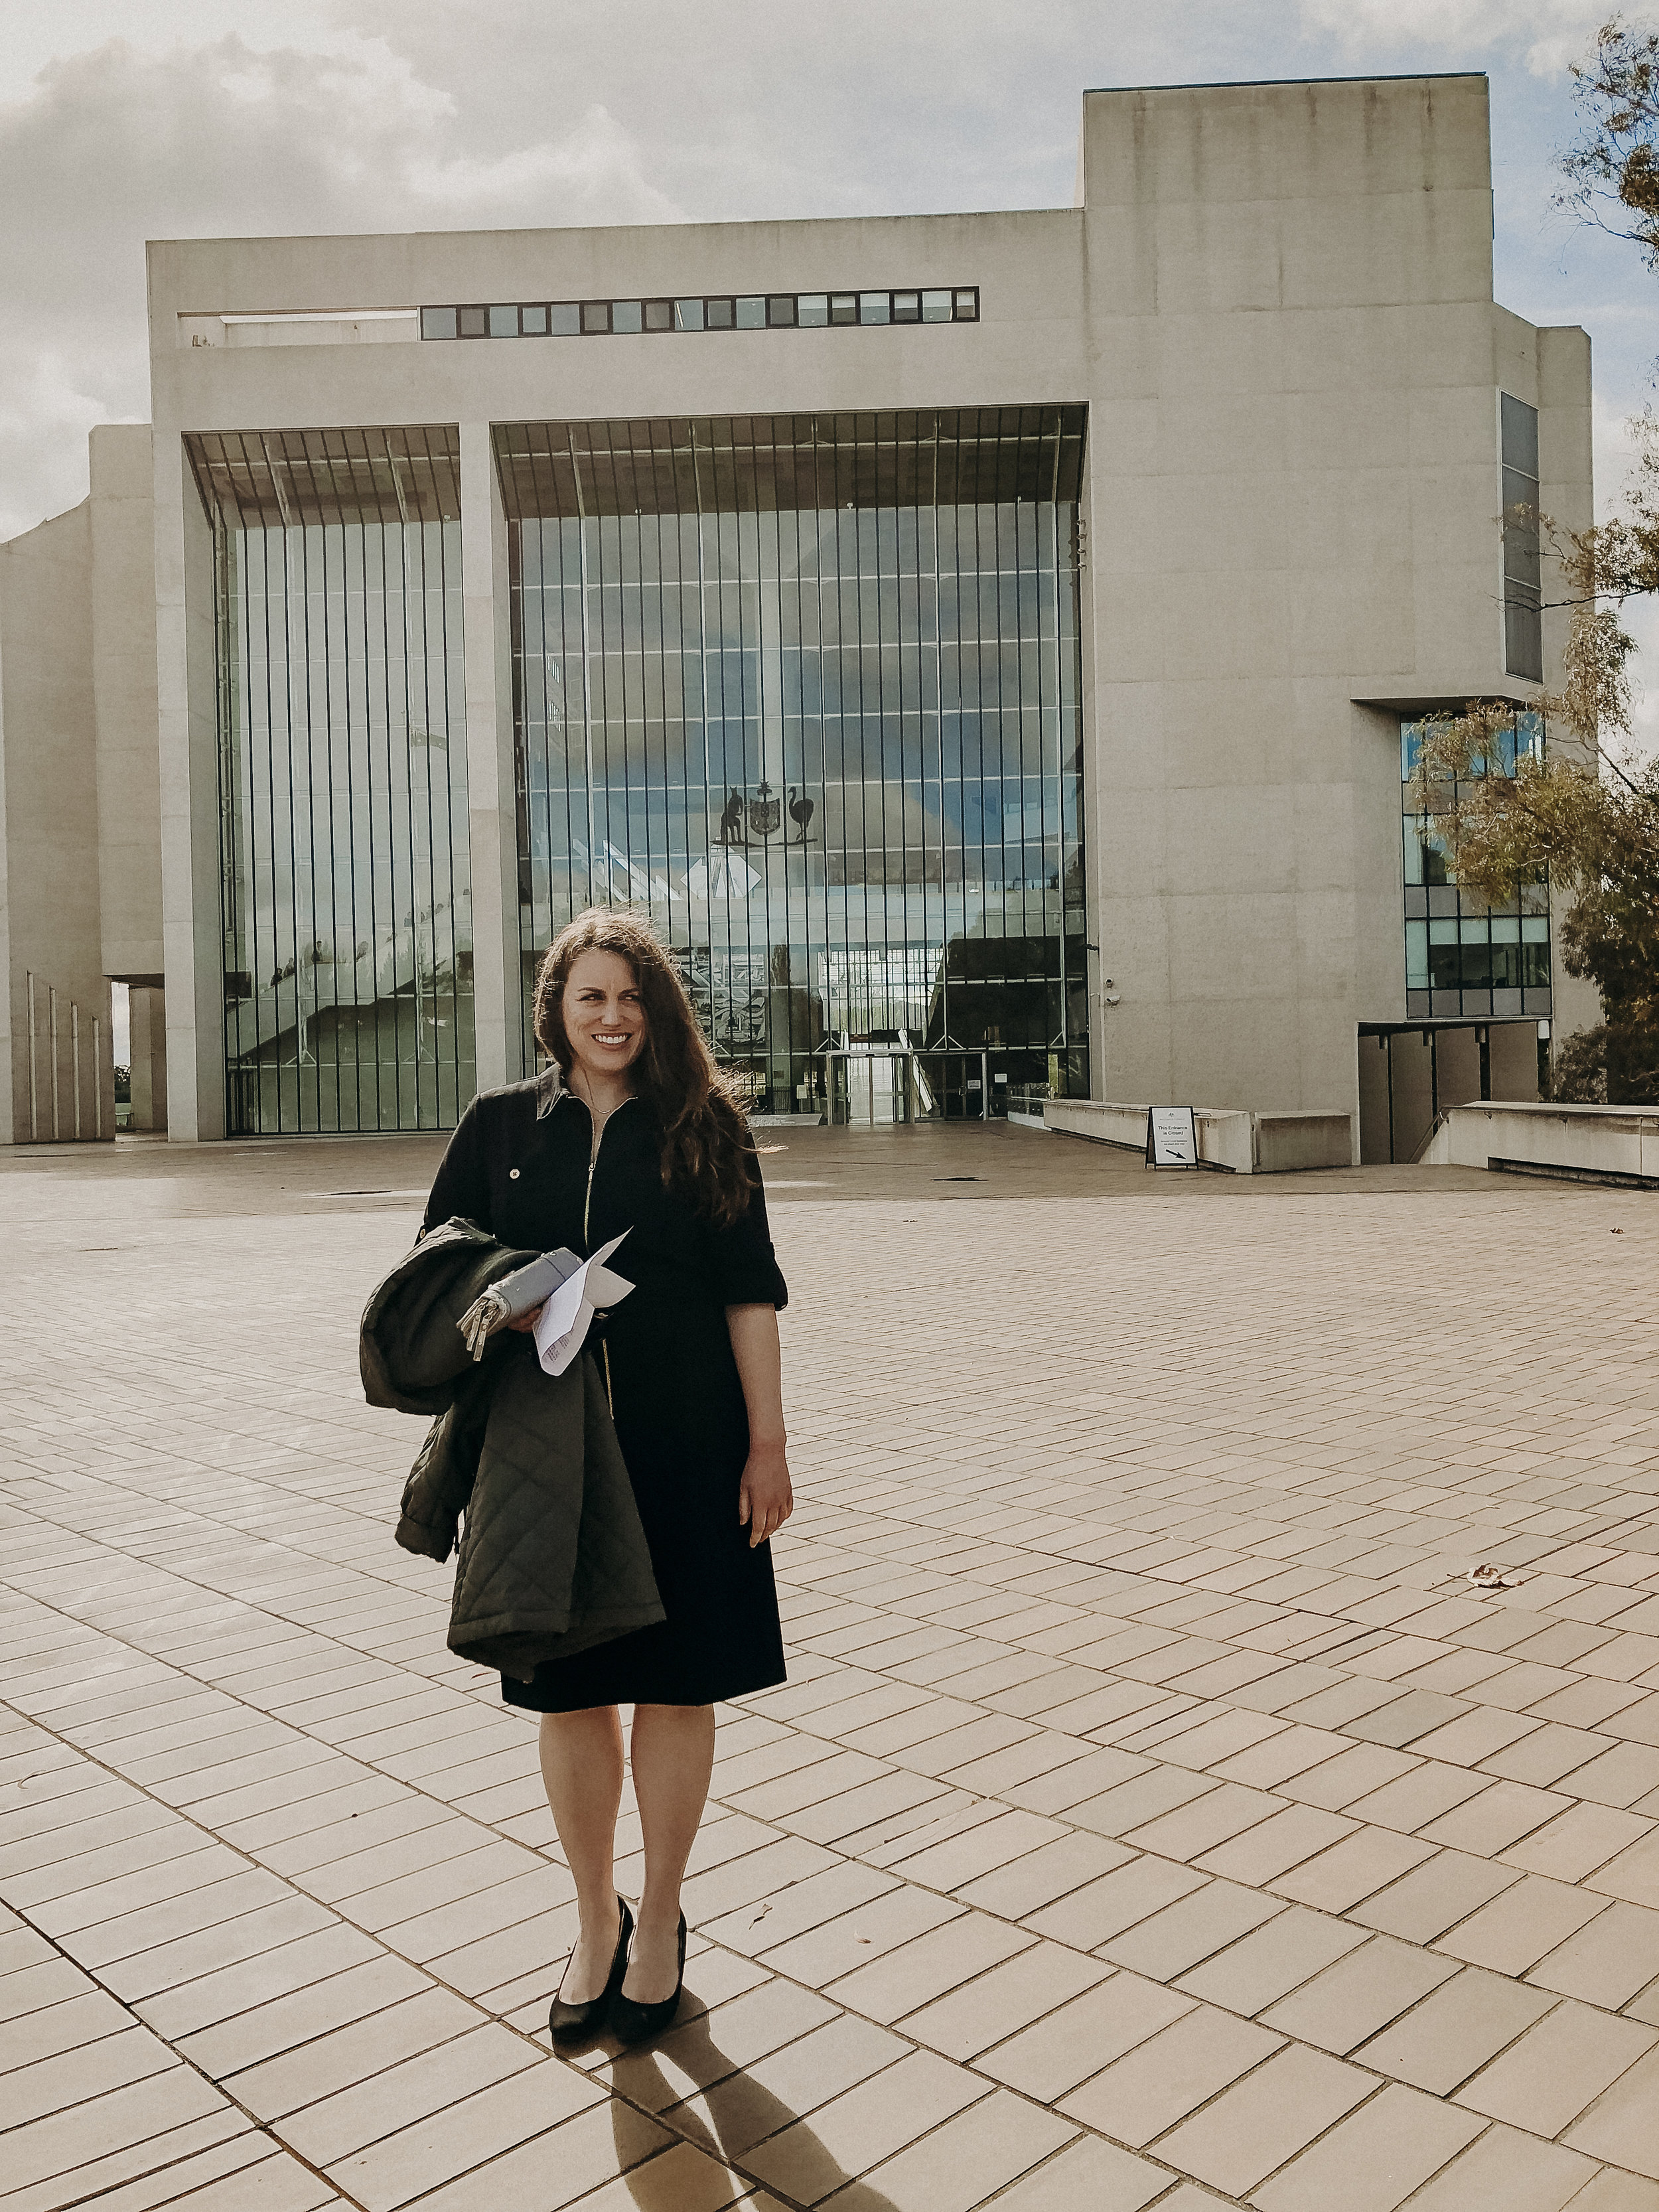 Christine outside the High Court of Australia.